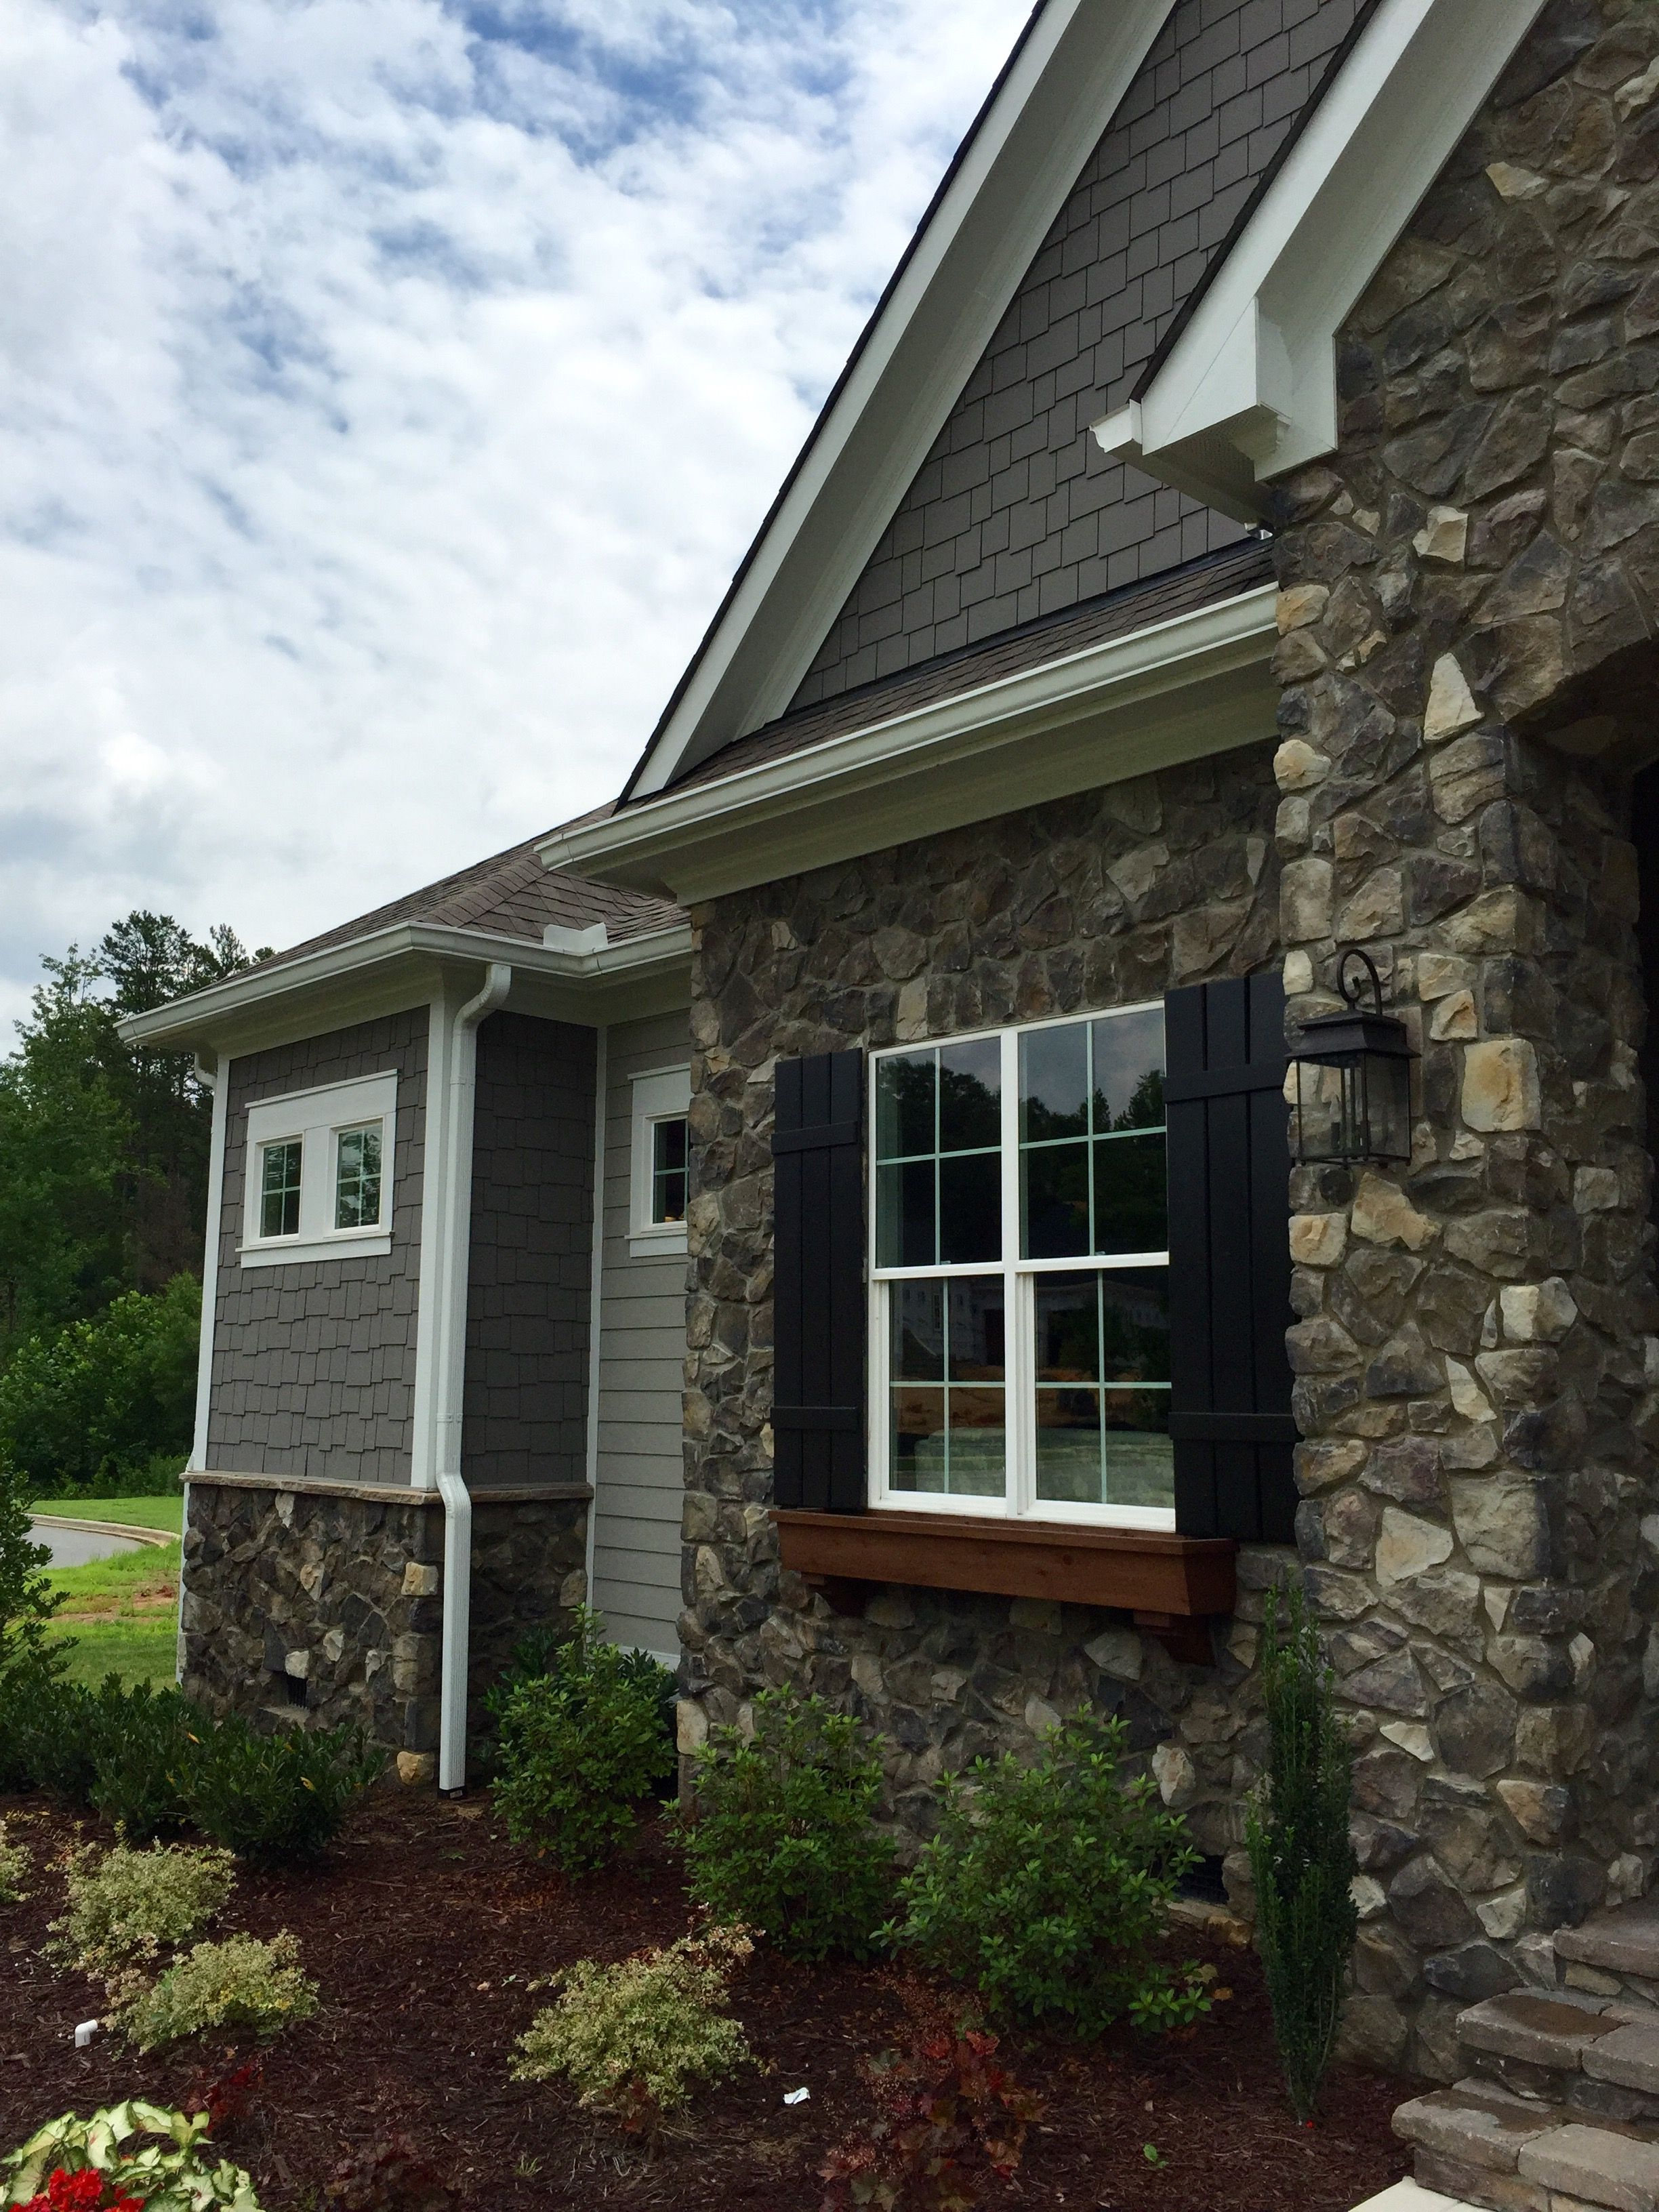 Arh exterior plan hampton e exterior 51 roof oc for Exterior metal paint in dark brown